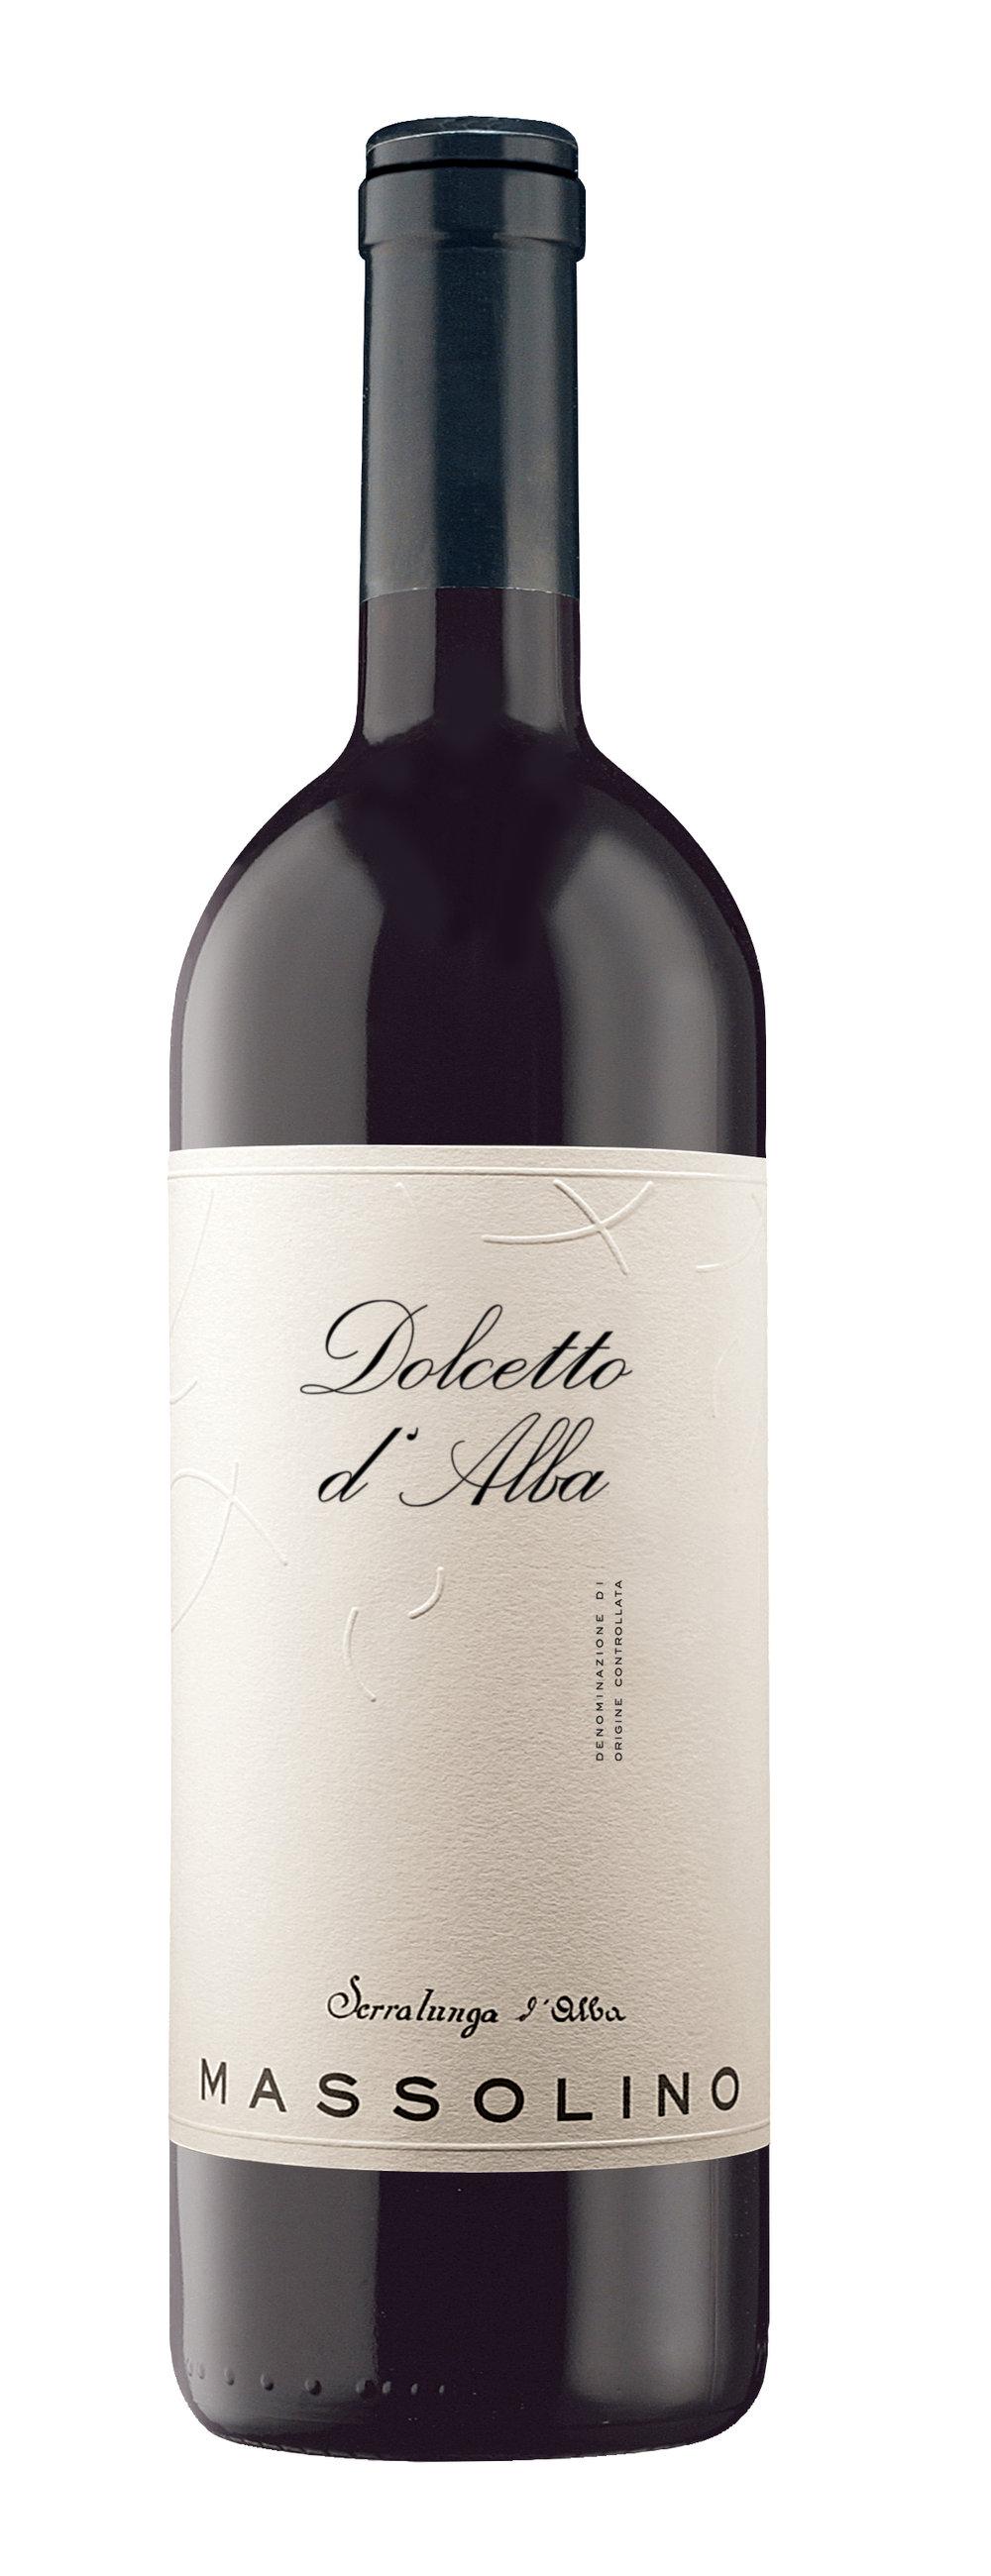 Massolino Dolcetto d'Alba Bottle.jpg